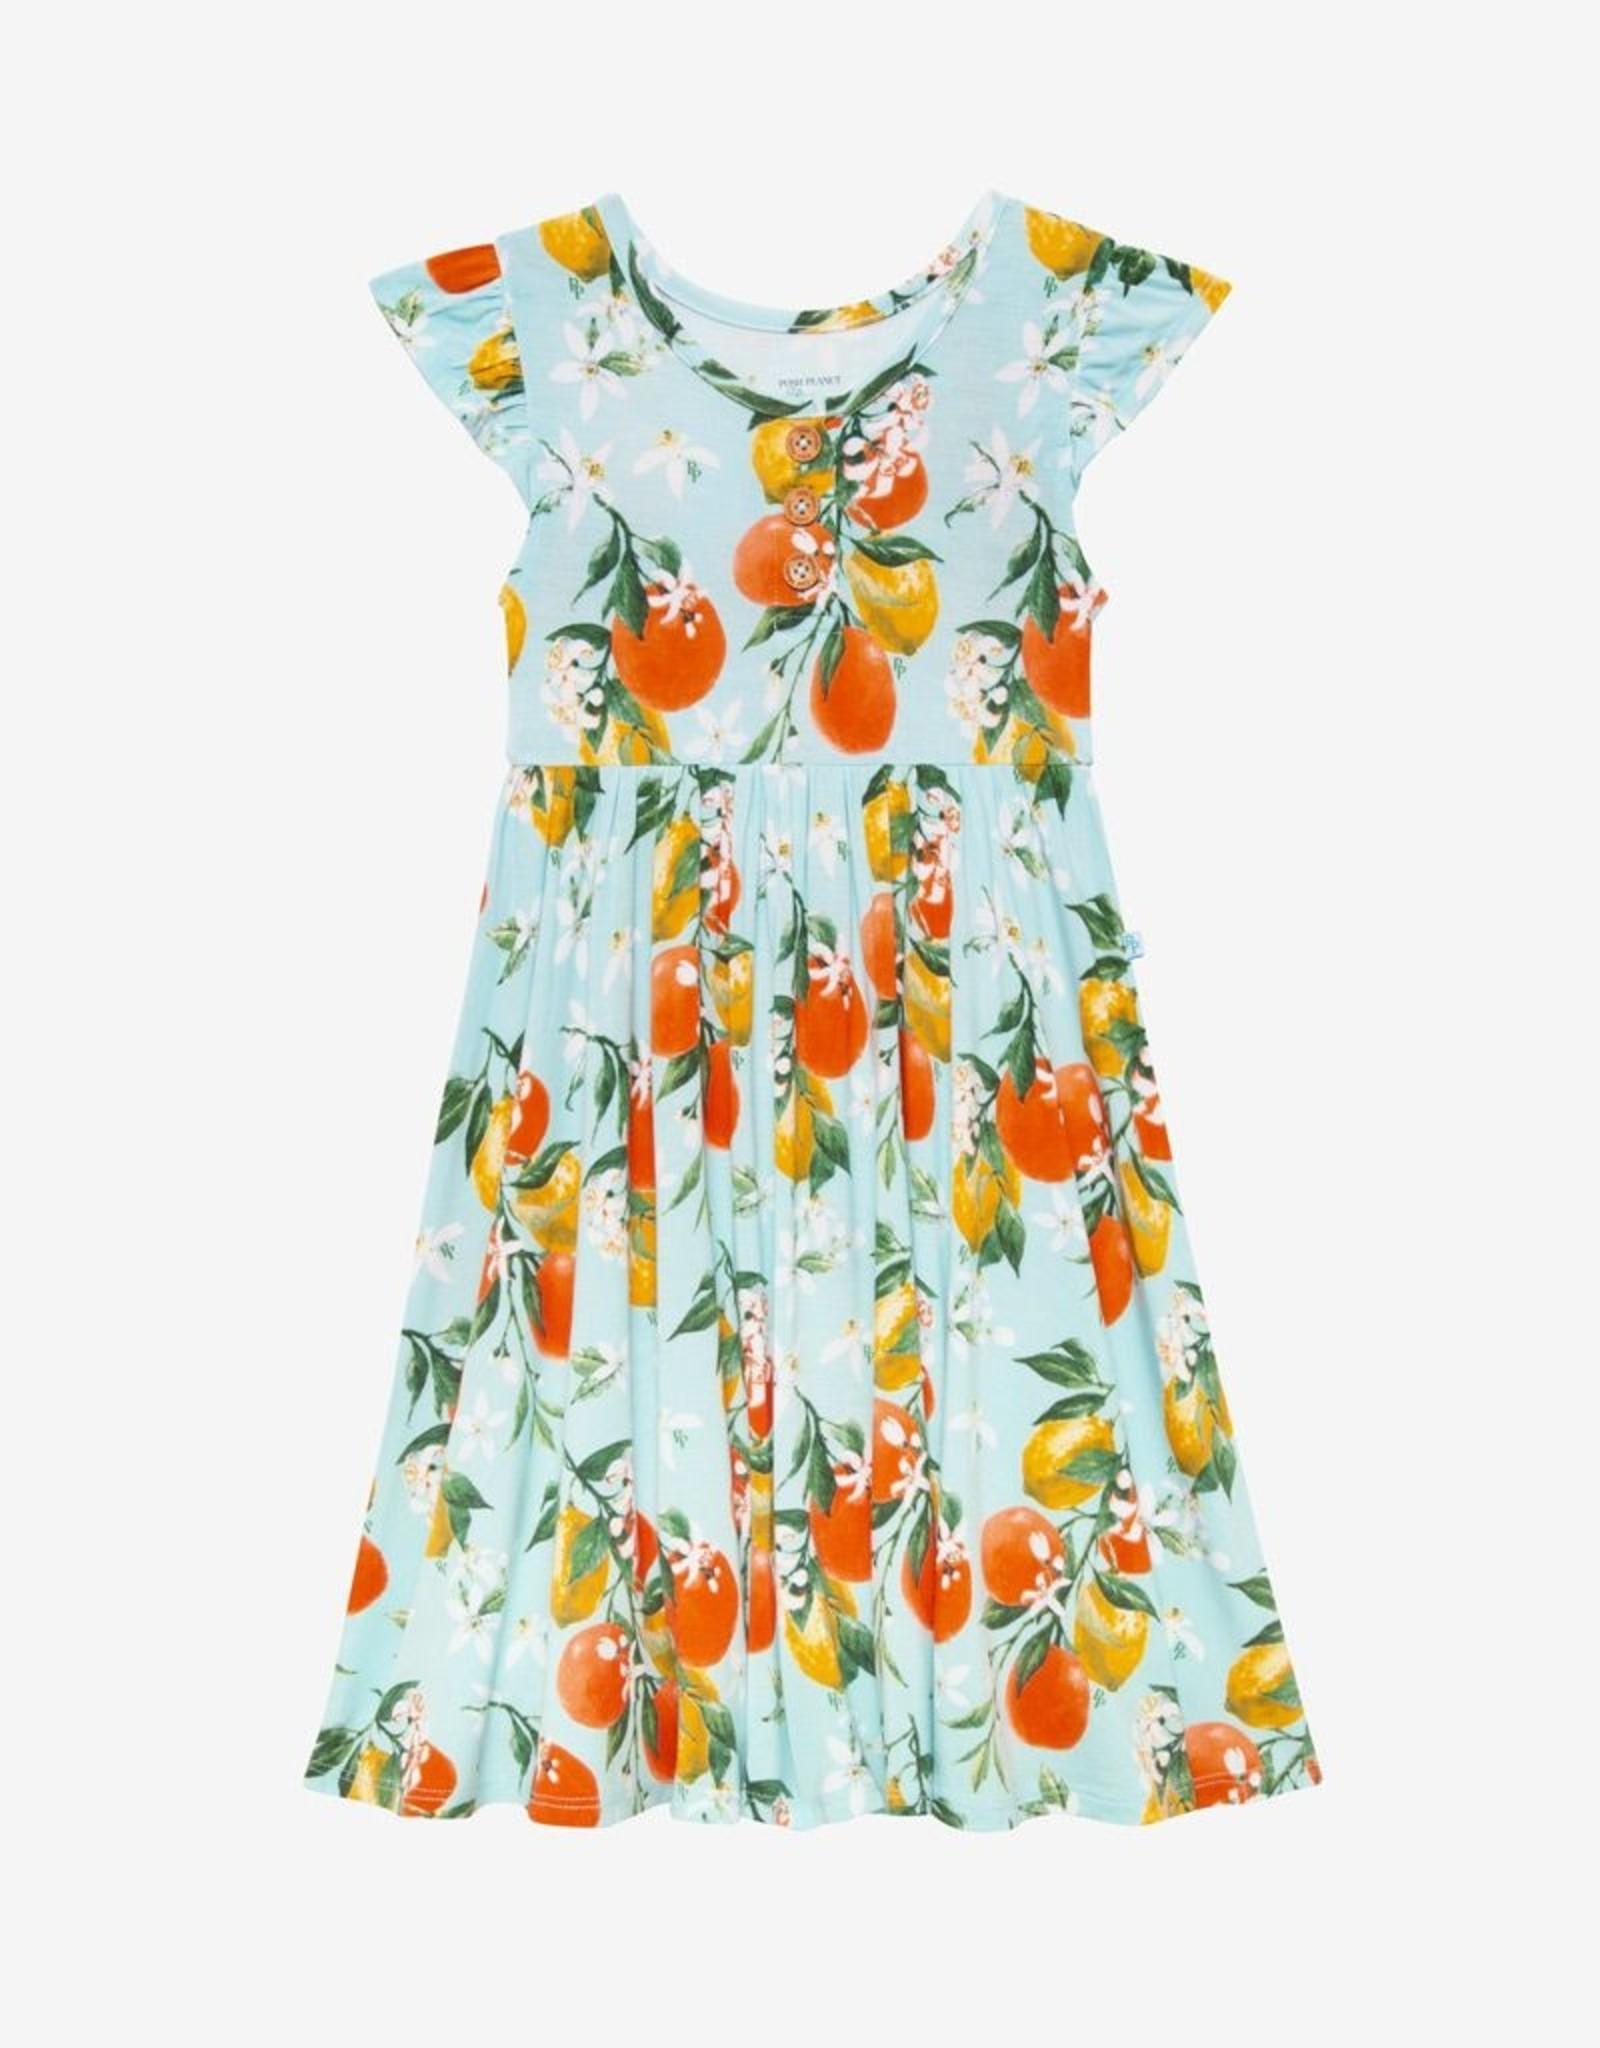 Posh Peanut Mirabella 2T capsleeve Henley Twirl Skirt Bodysuit